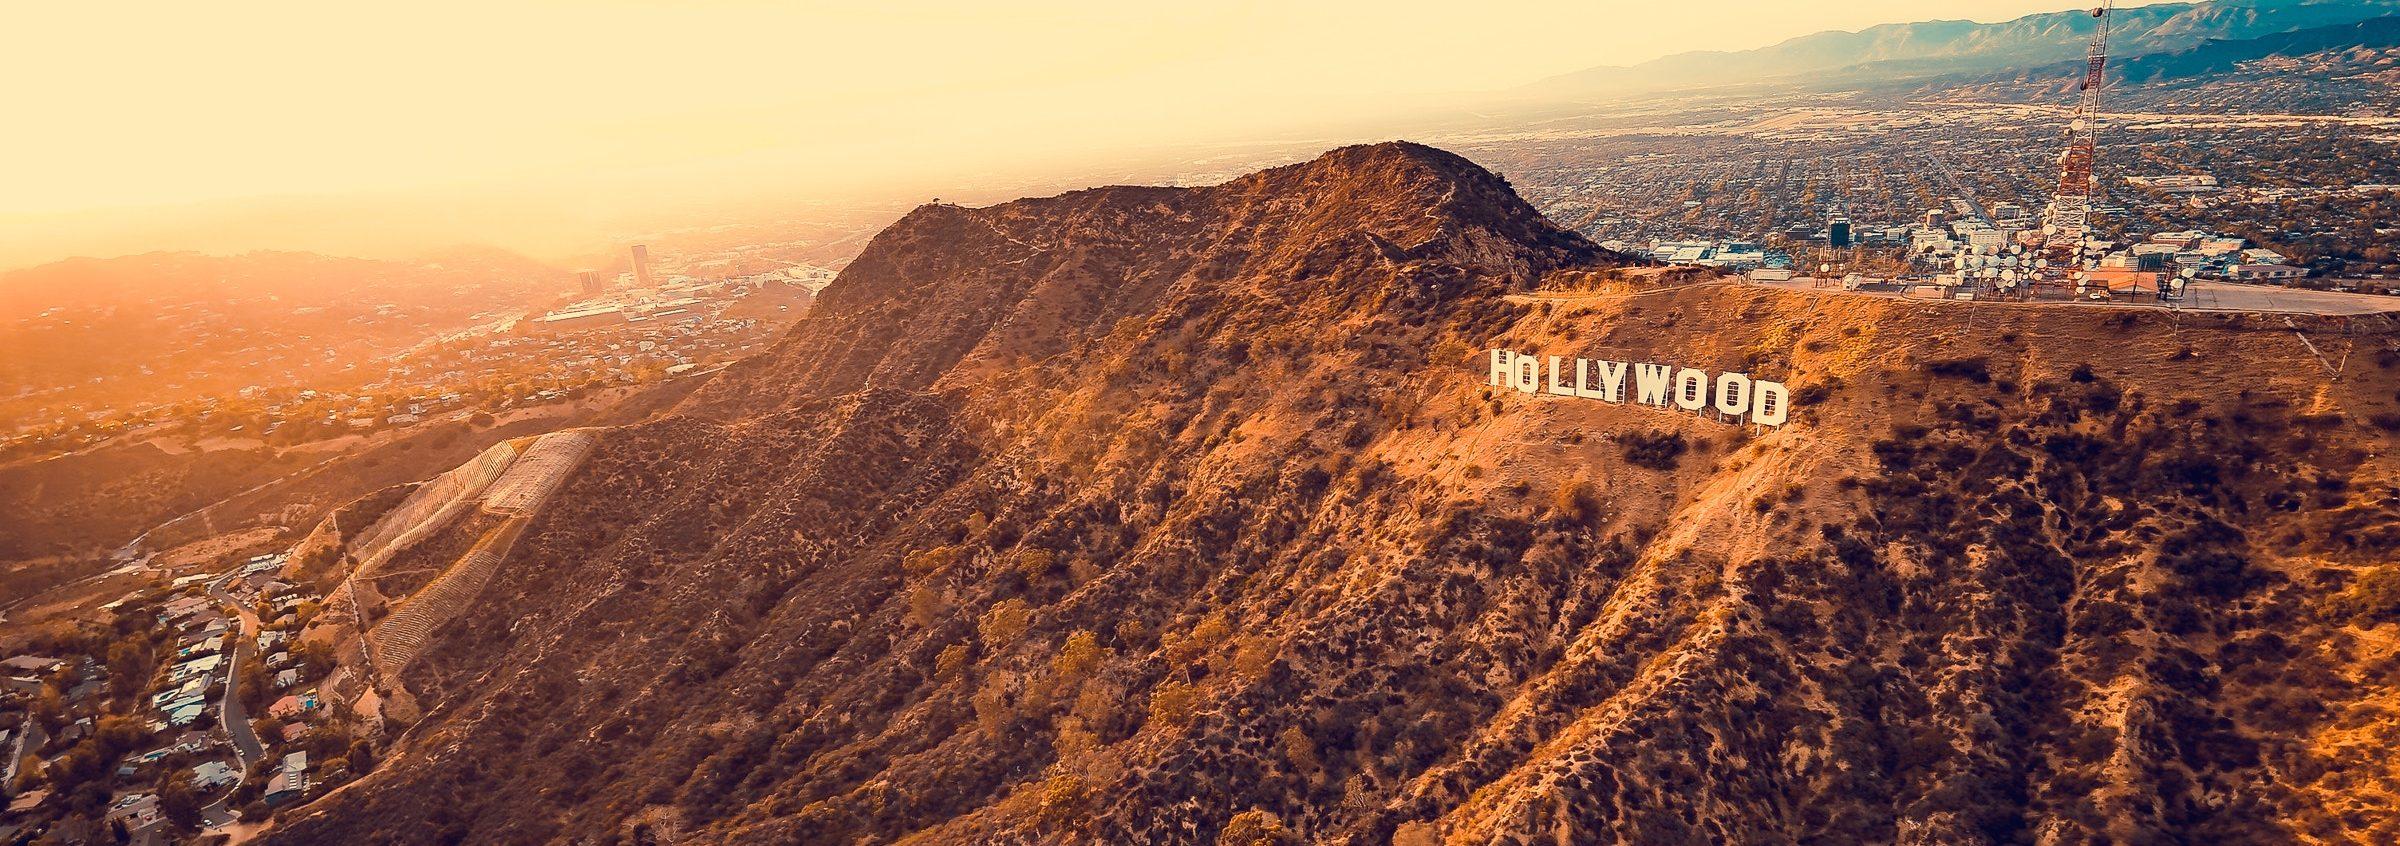 Ray Ban et Hollywood